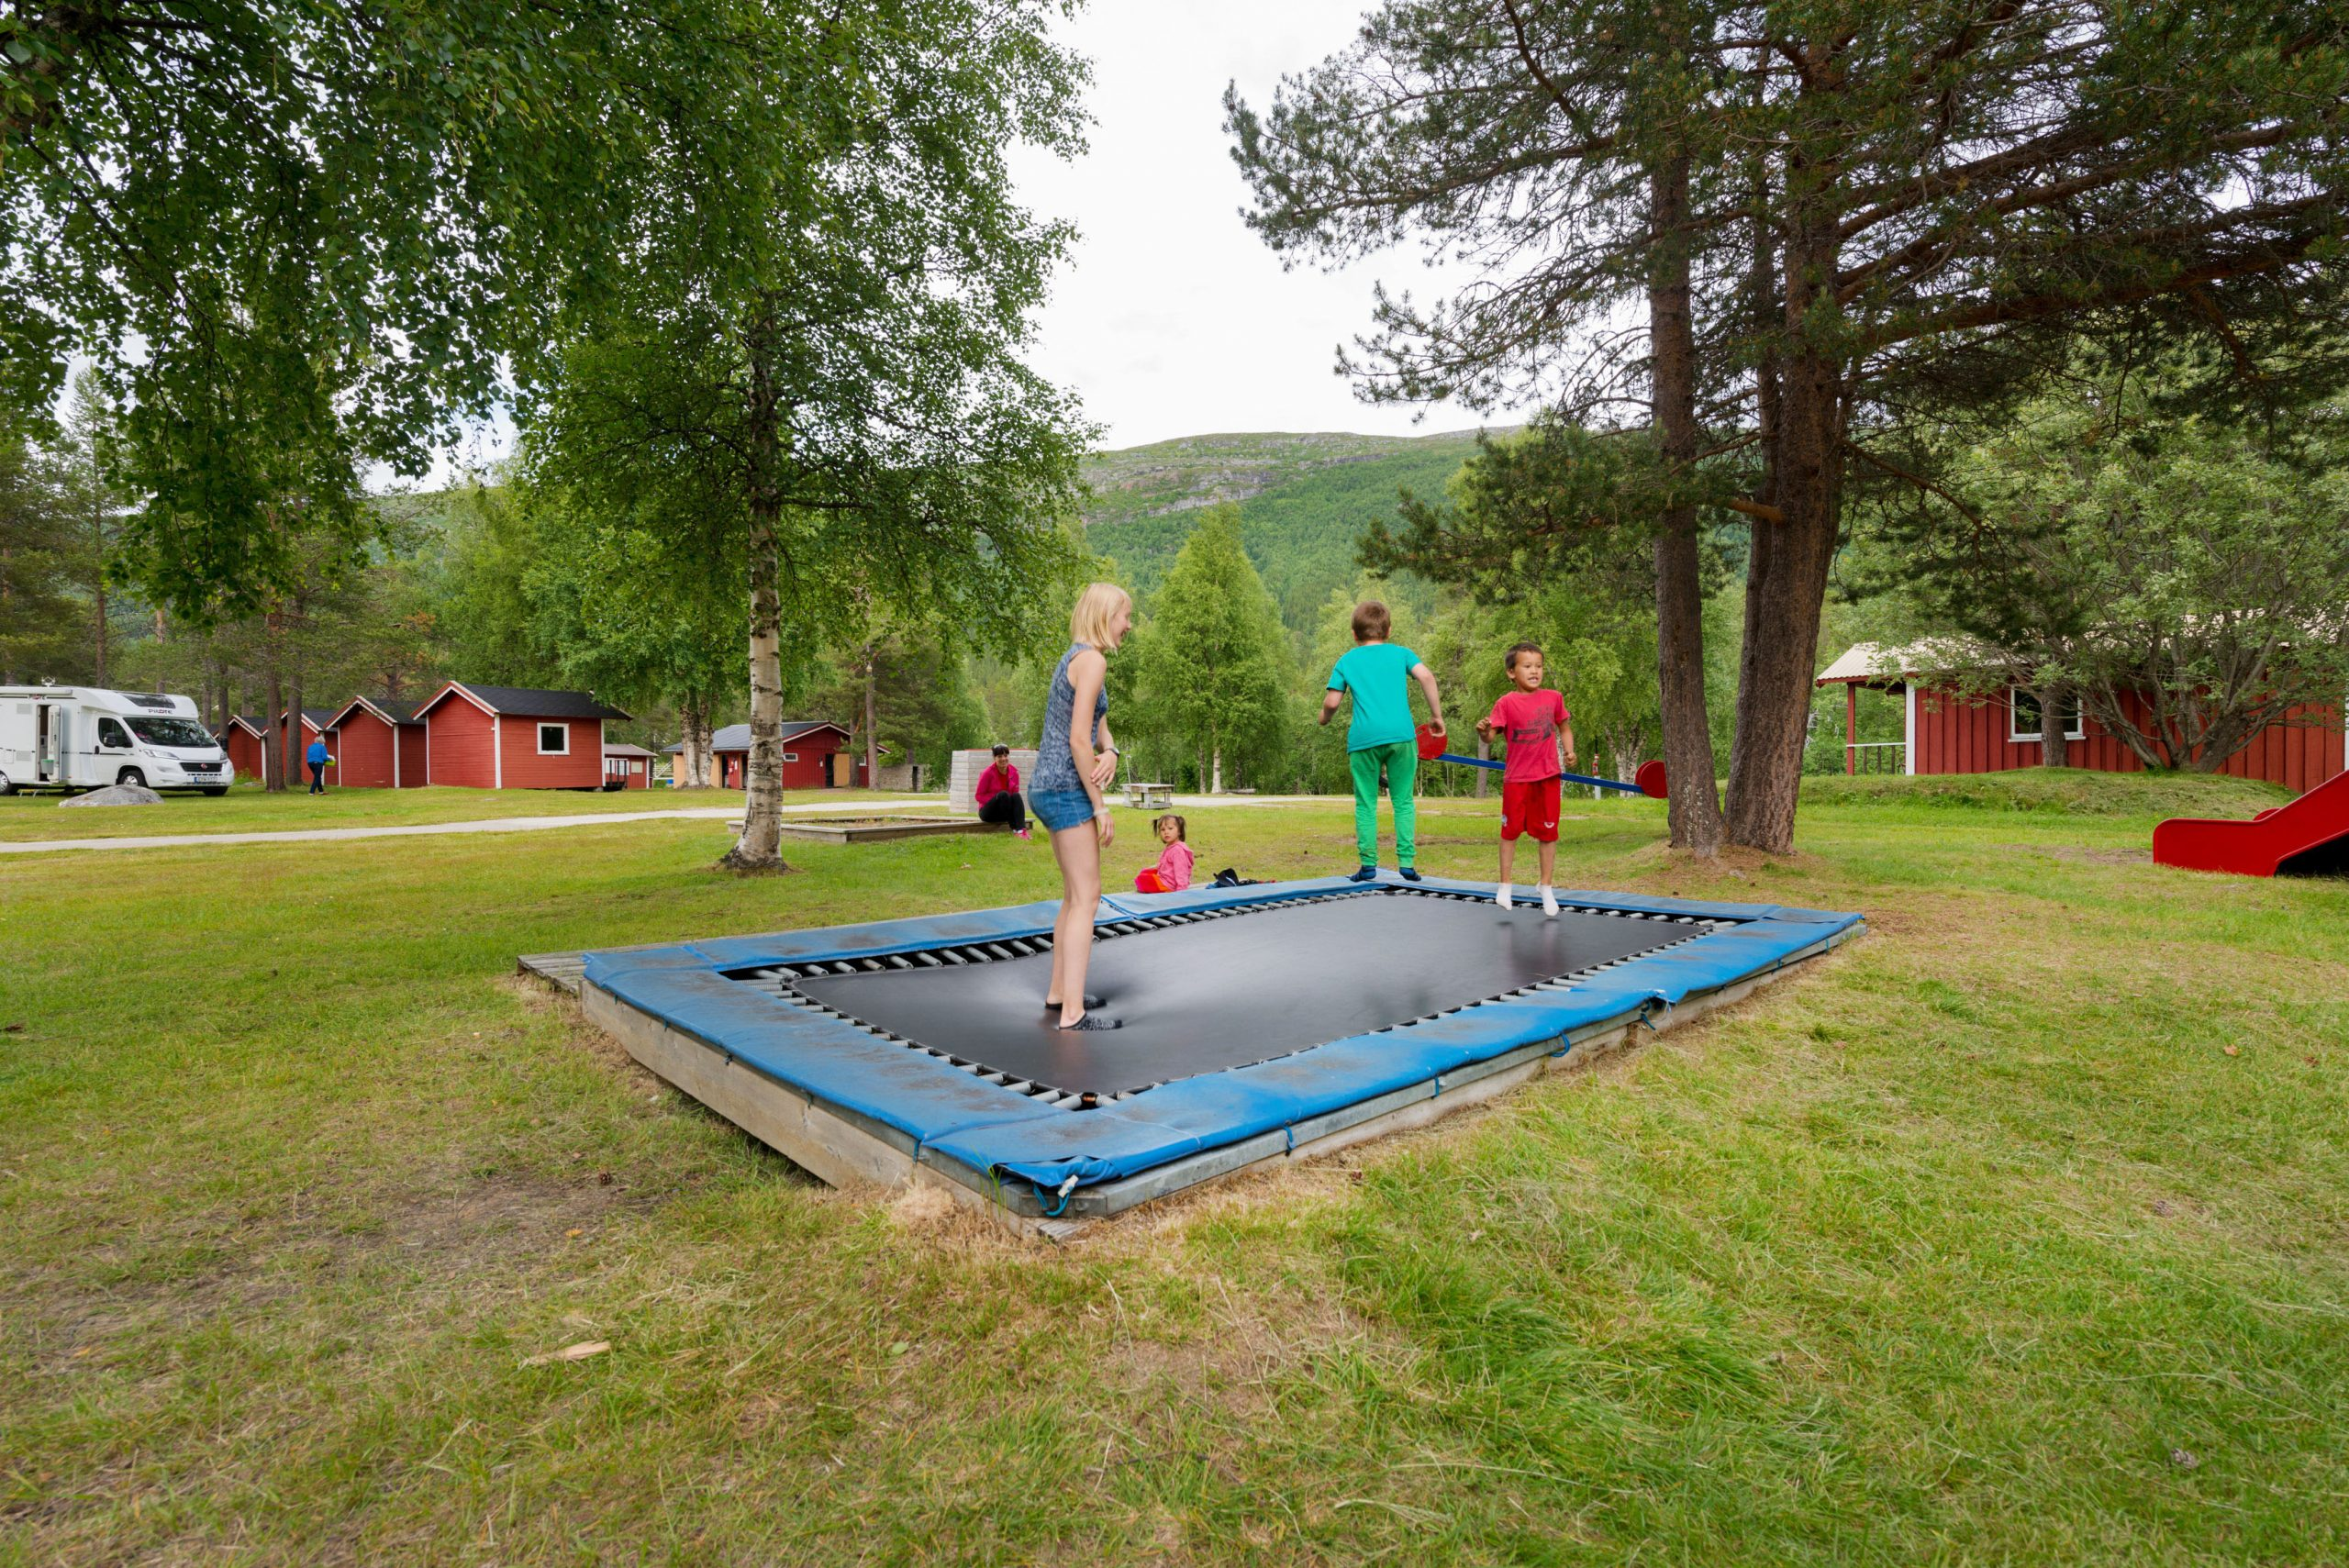 Barn som leker på trampoline